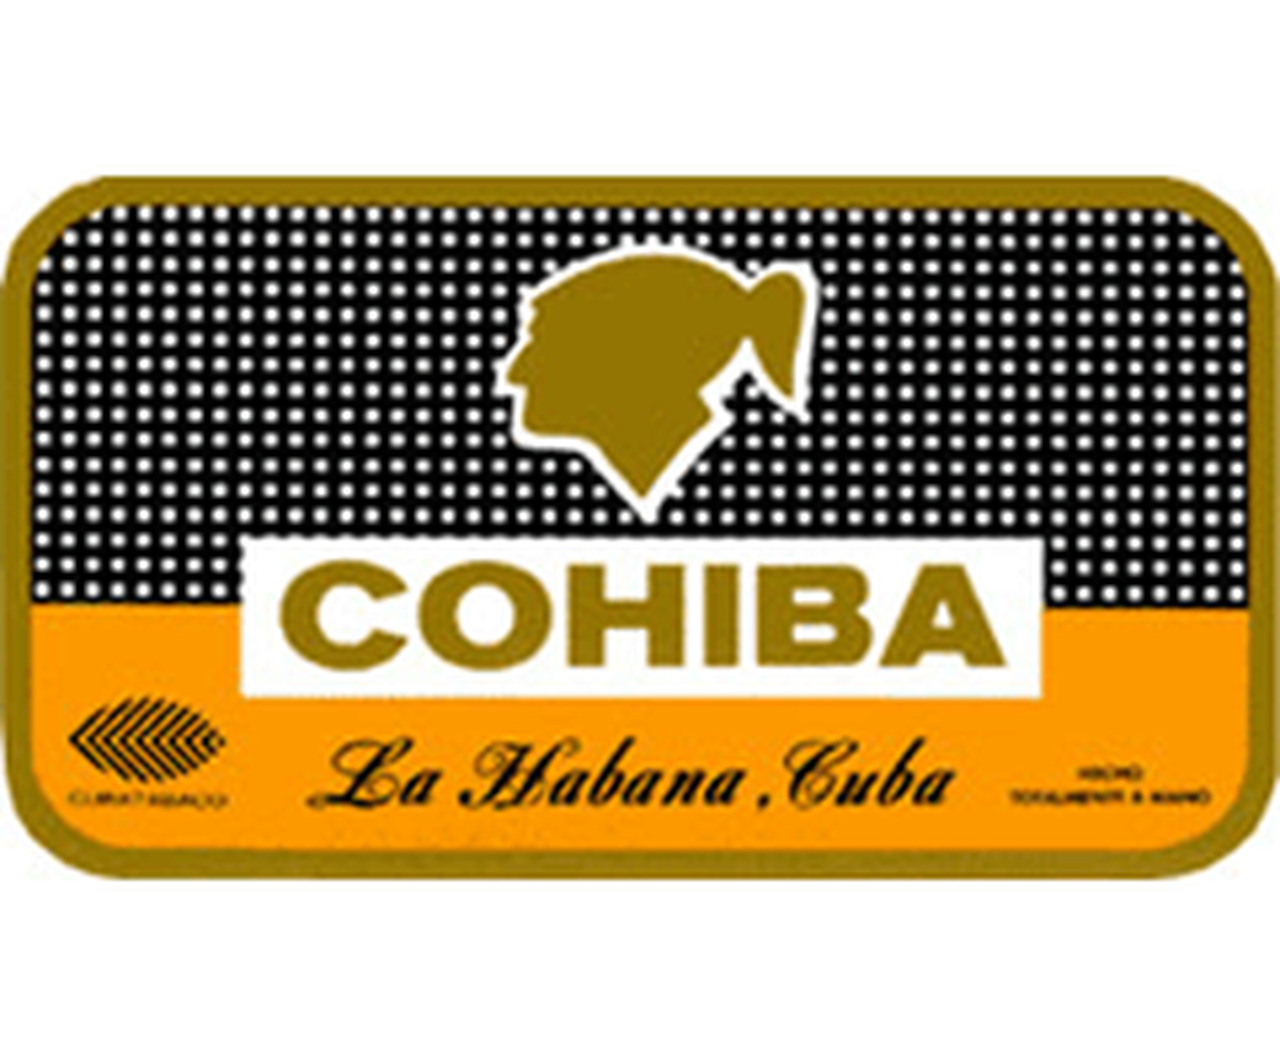 Cohiba 高希霸